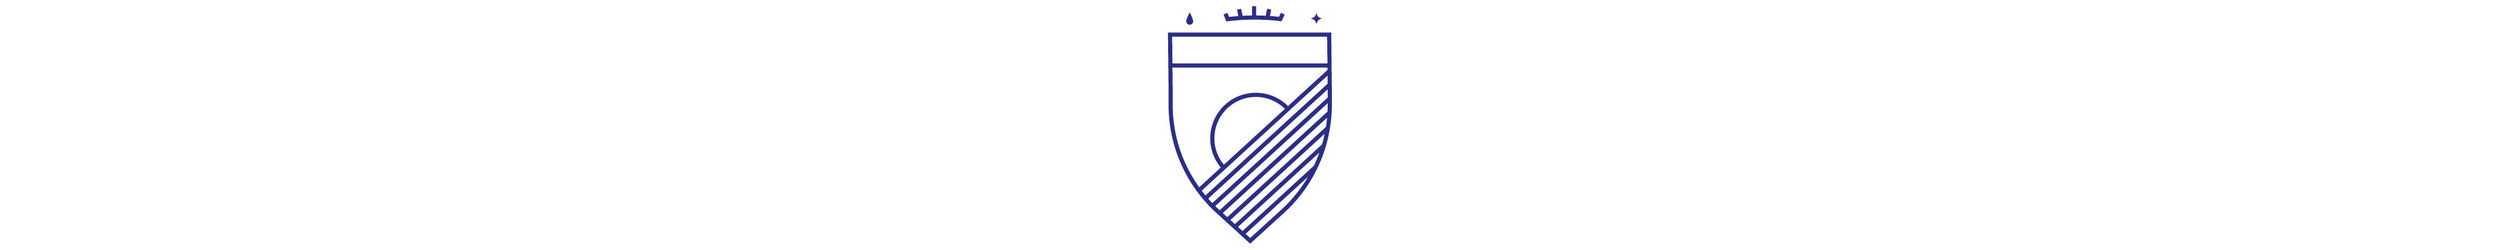 White block footer logo.jpg